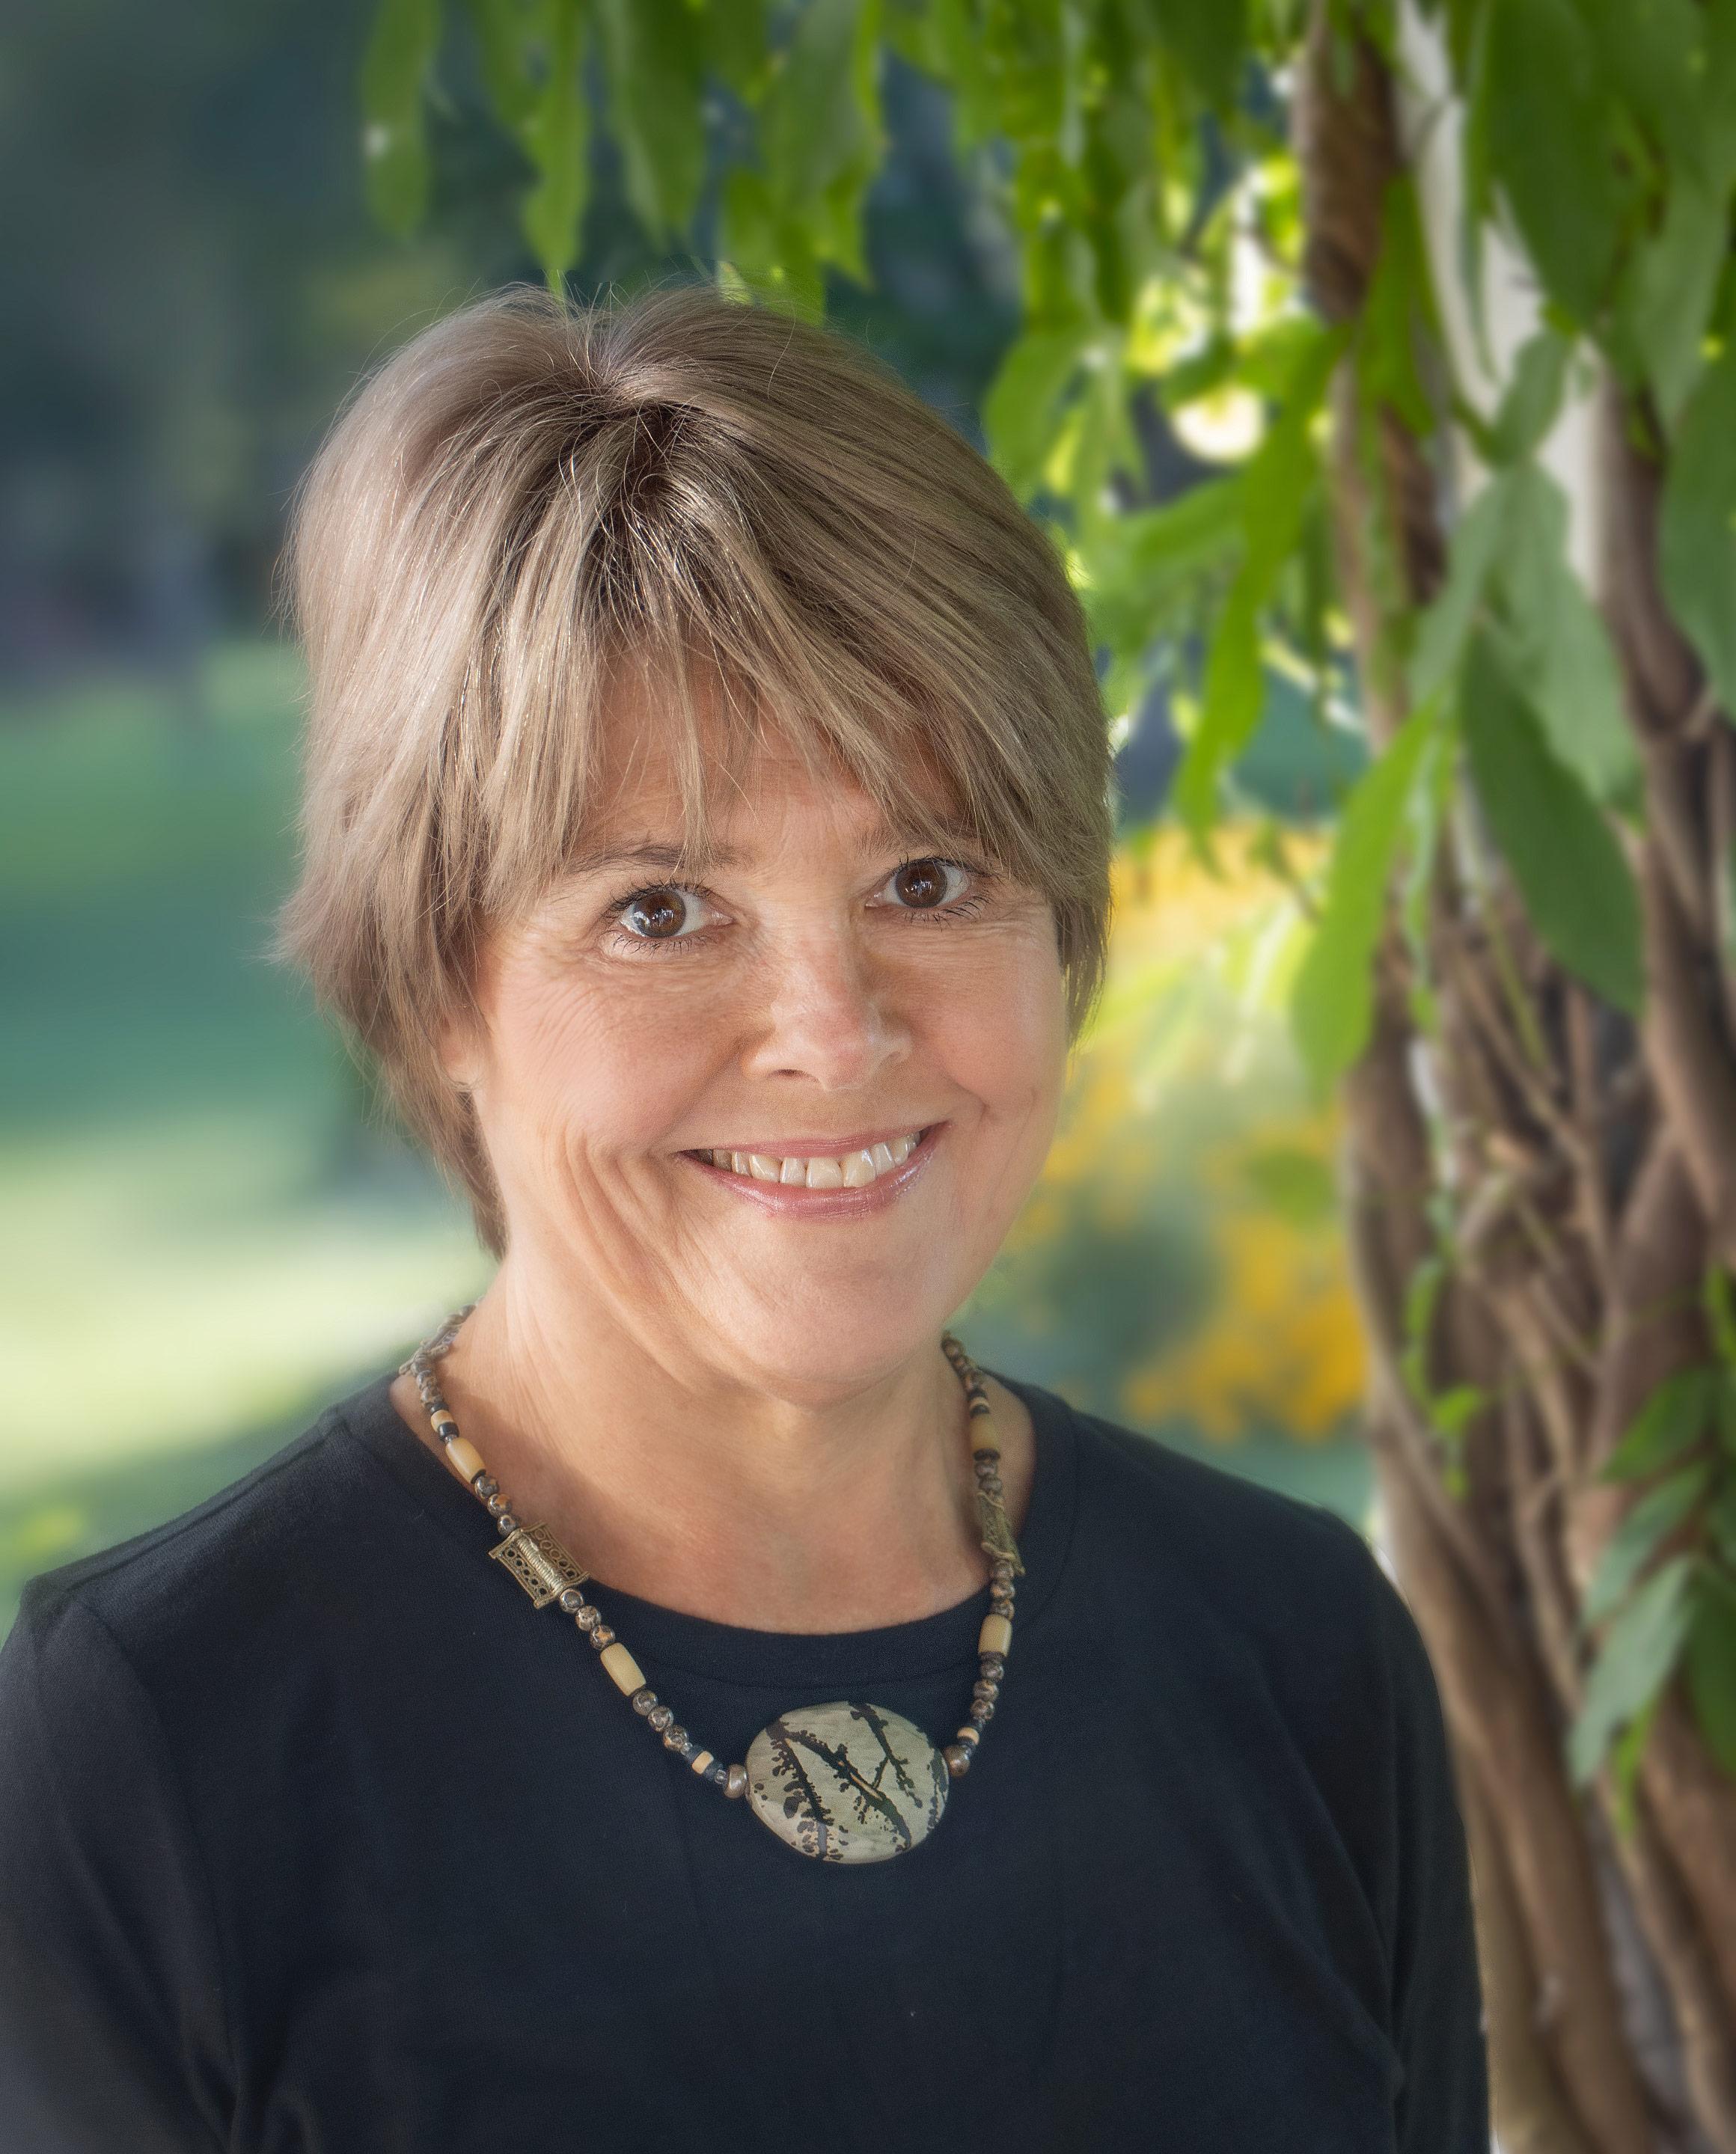 Susan Grajek